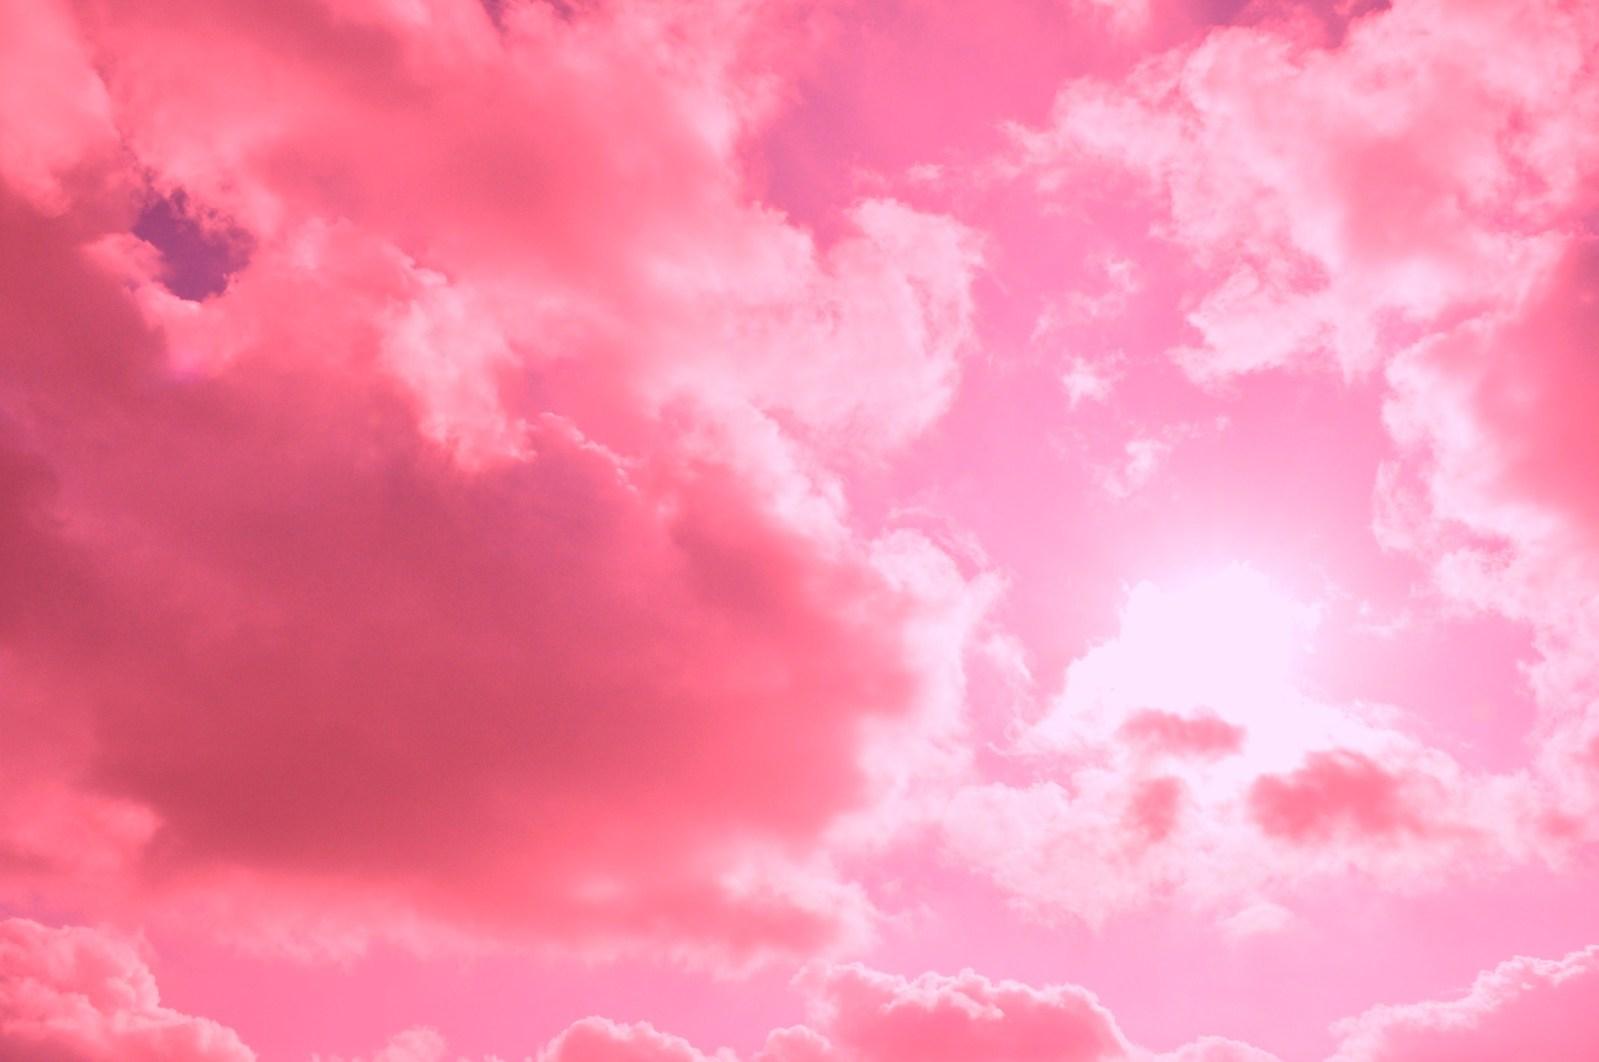 Daftar Wallpaper Pink Cloud Wallpaper Bbm